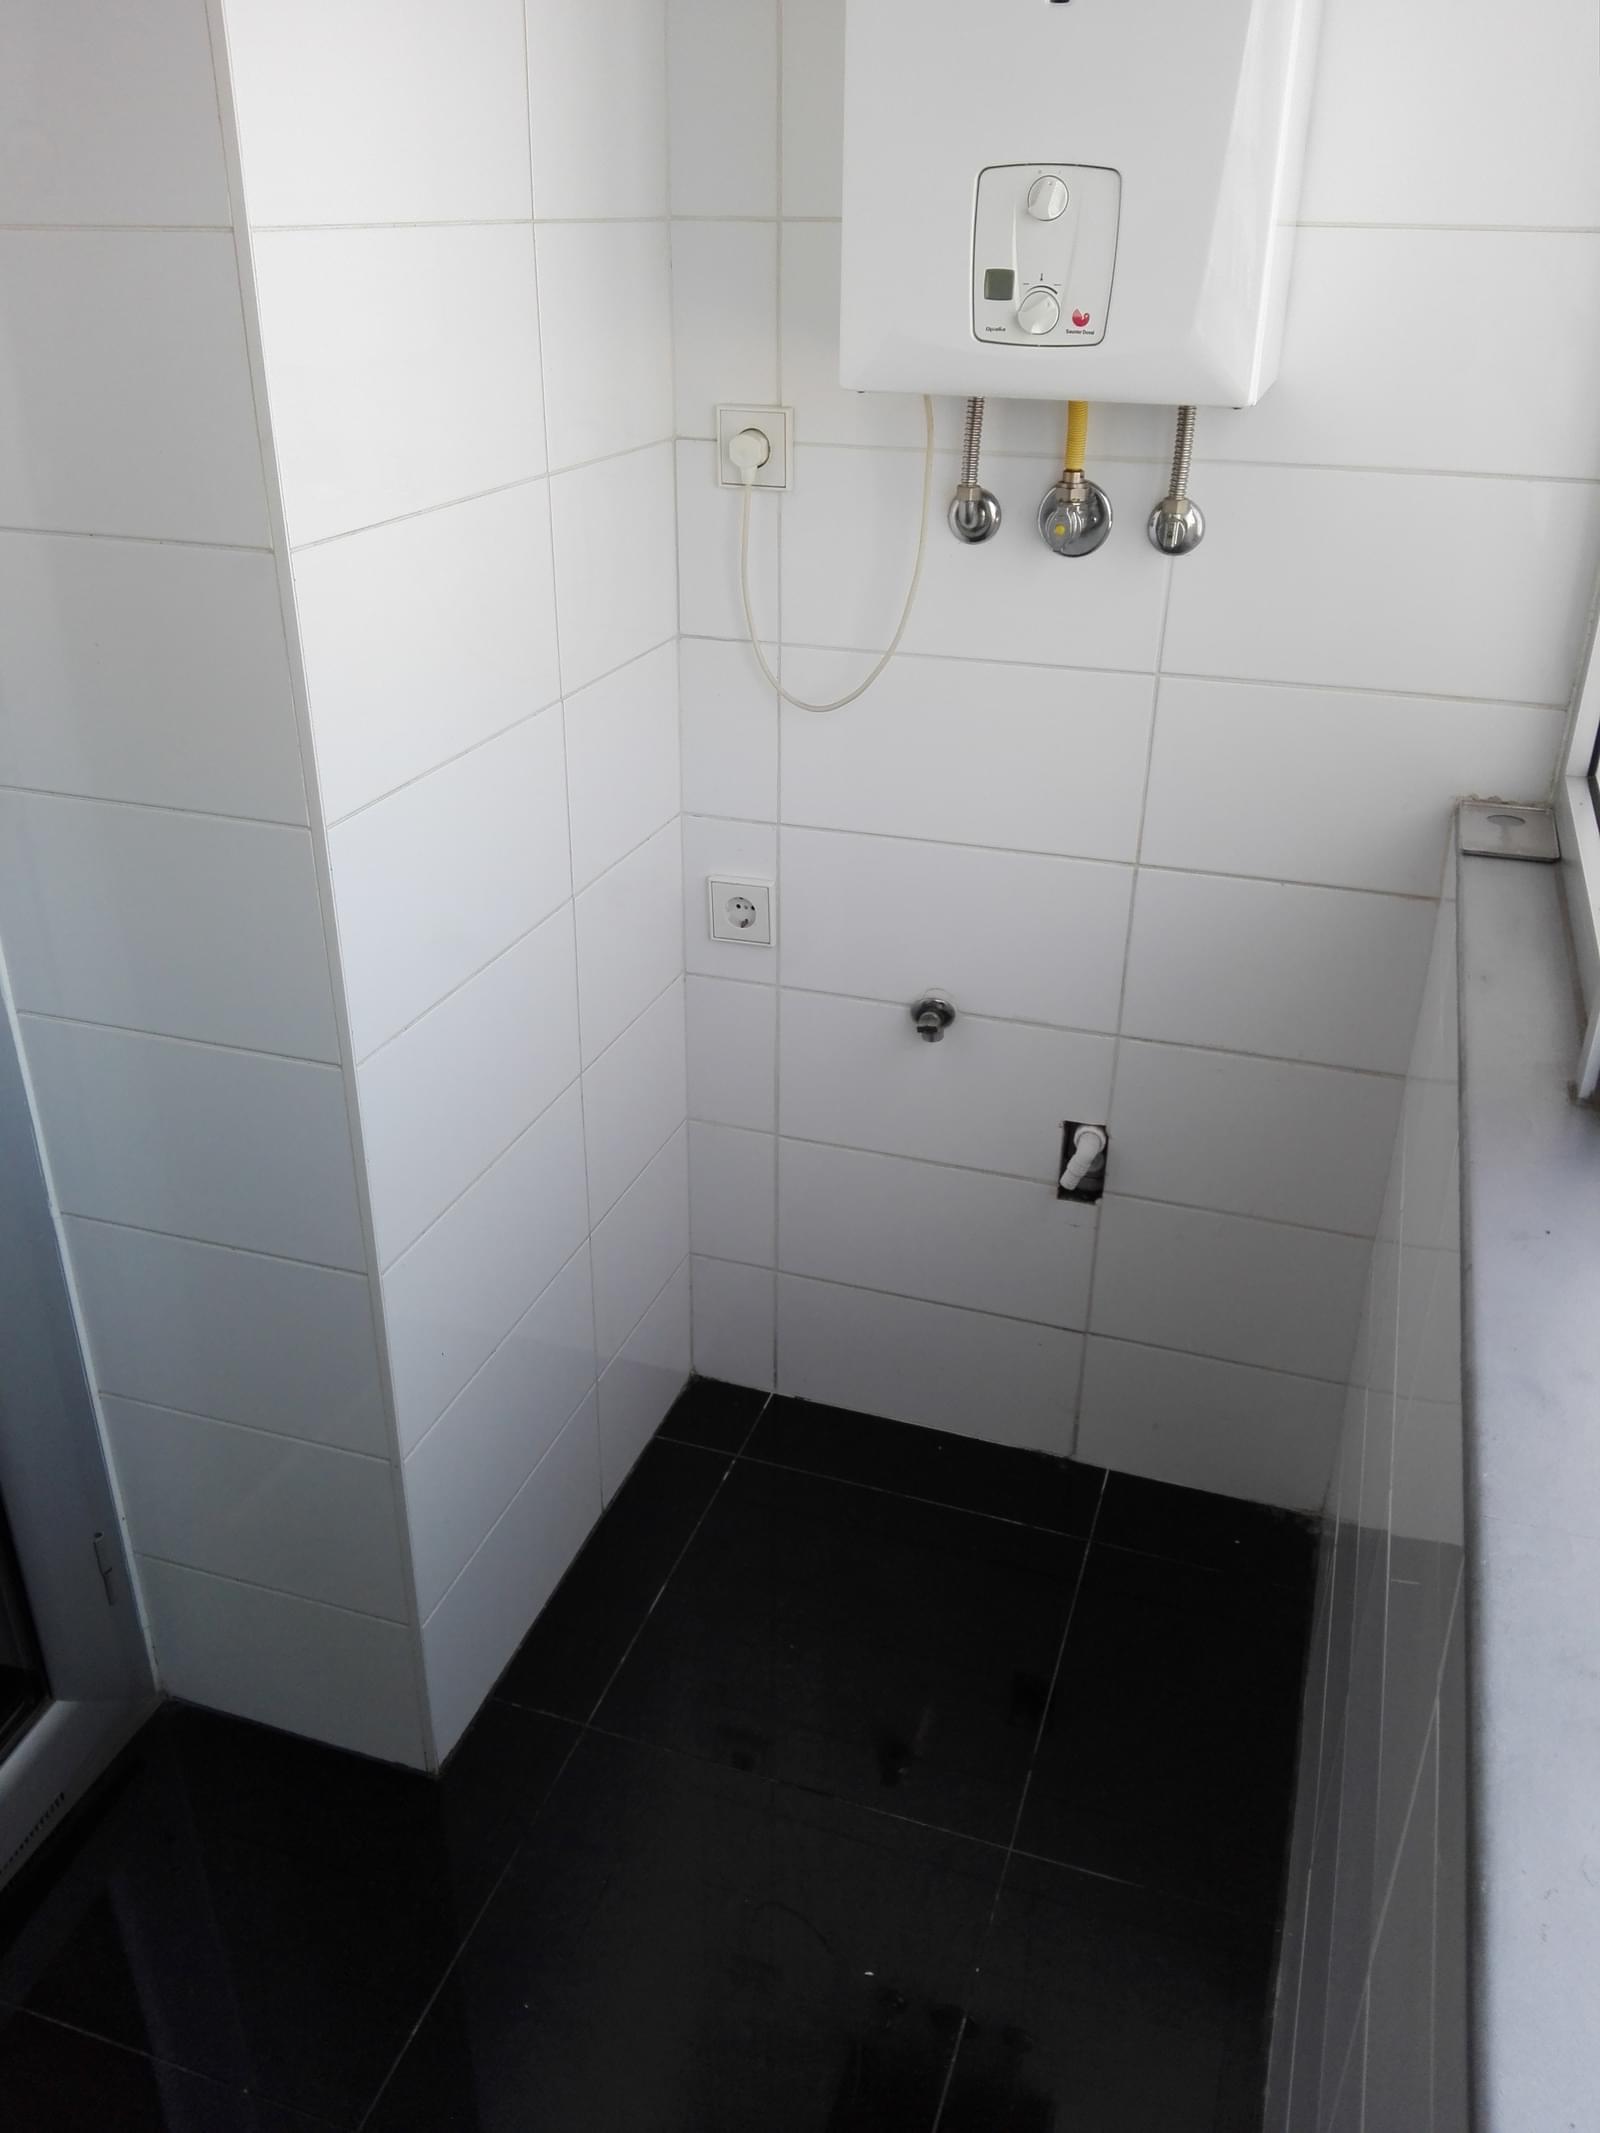 pf18814-apartamento-t2-lisboa-5fe56717-b44e-4779-8ca7-bb5ef580acb6